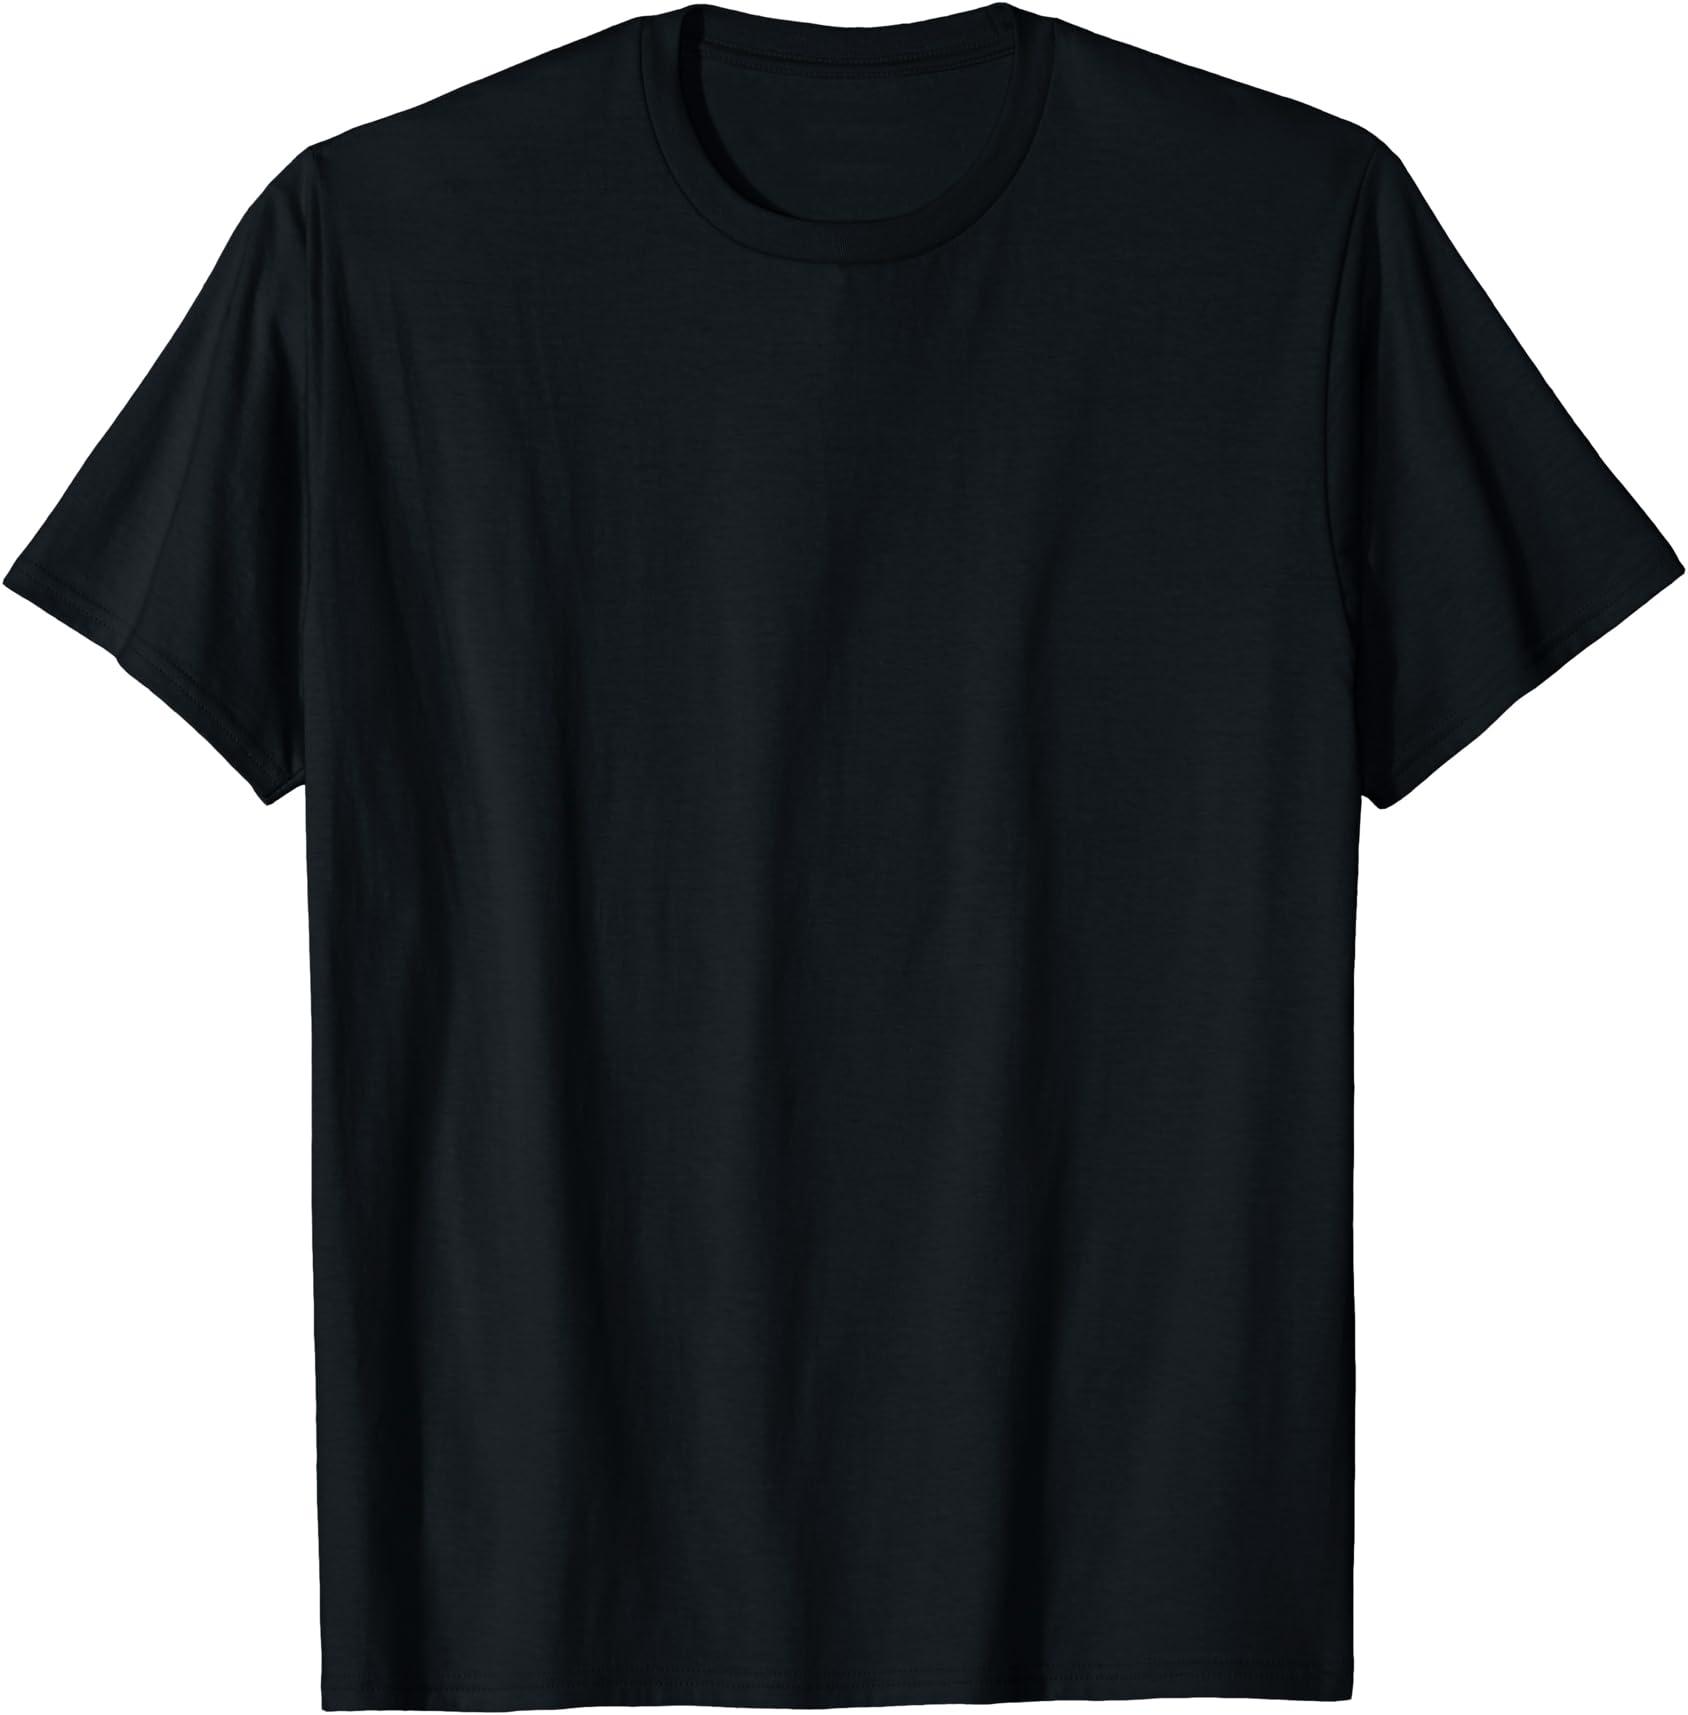 Funny sarcastic Fishing shirt I fish so I don/'t strangle people